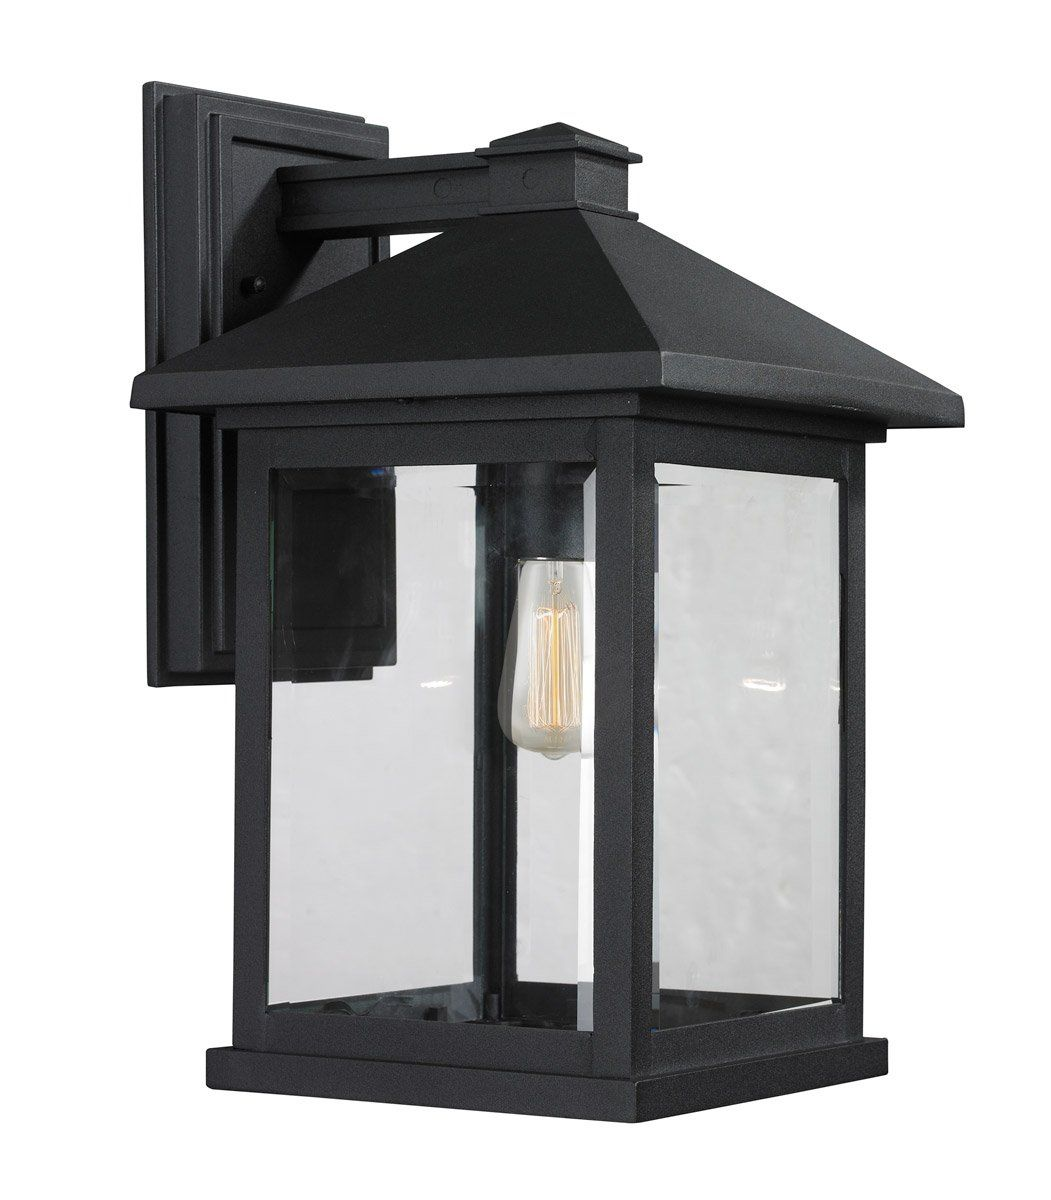 Z Lite 531b Bk Portland 1 Light 16 Inch Black Outdoor Wall Sconce In Clear Beveled Glass Black Outdoor Wall Lights Outdoor Sconces Wall Lantern